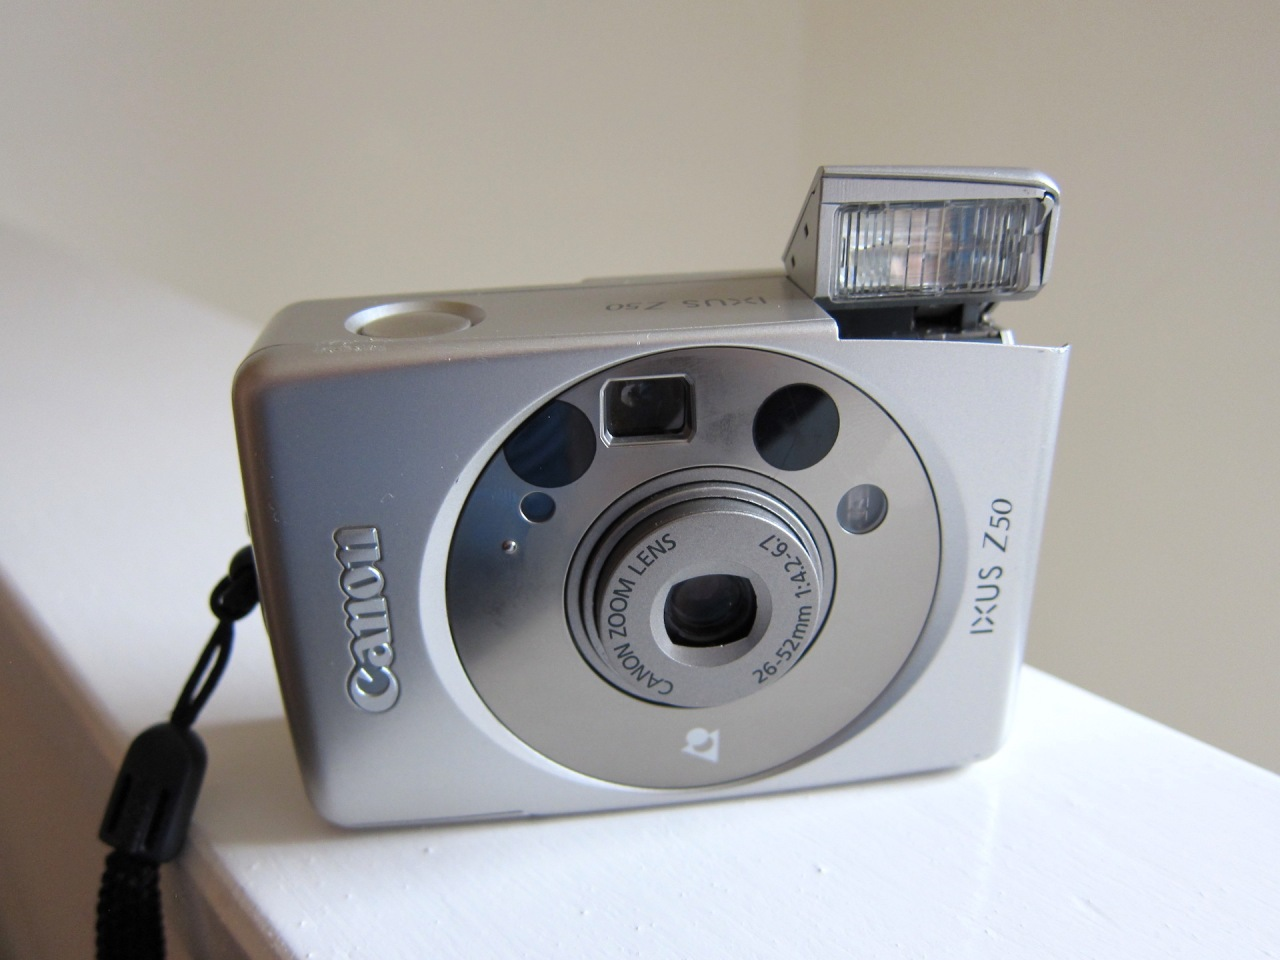 Canon Ixus Z50 (ELPH LT260, IXY 220)APS